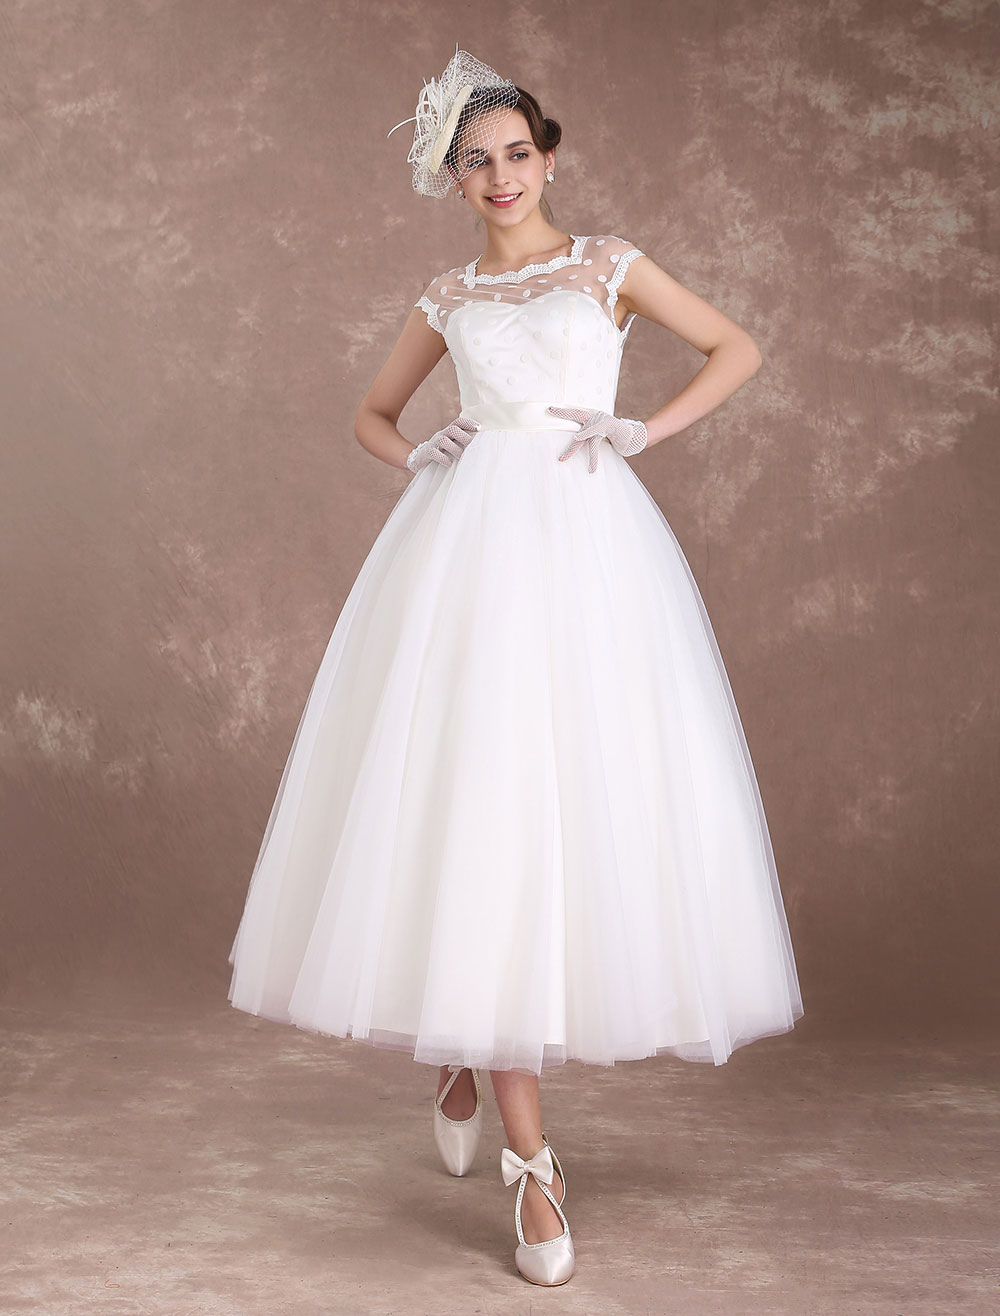 Short Wedding Dresses Vintage 1950's Bridal Dress Open Back Polka Dot Ivory A Line Tea Length Wedding Reception Dress Milanoo